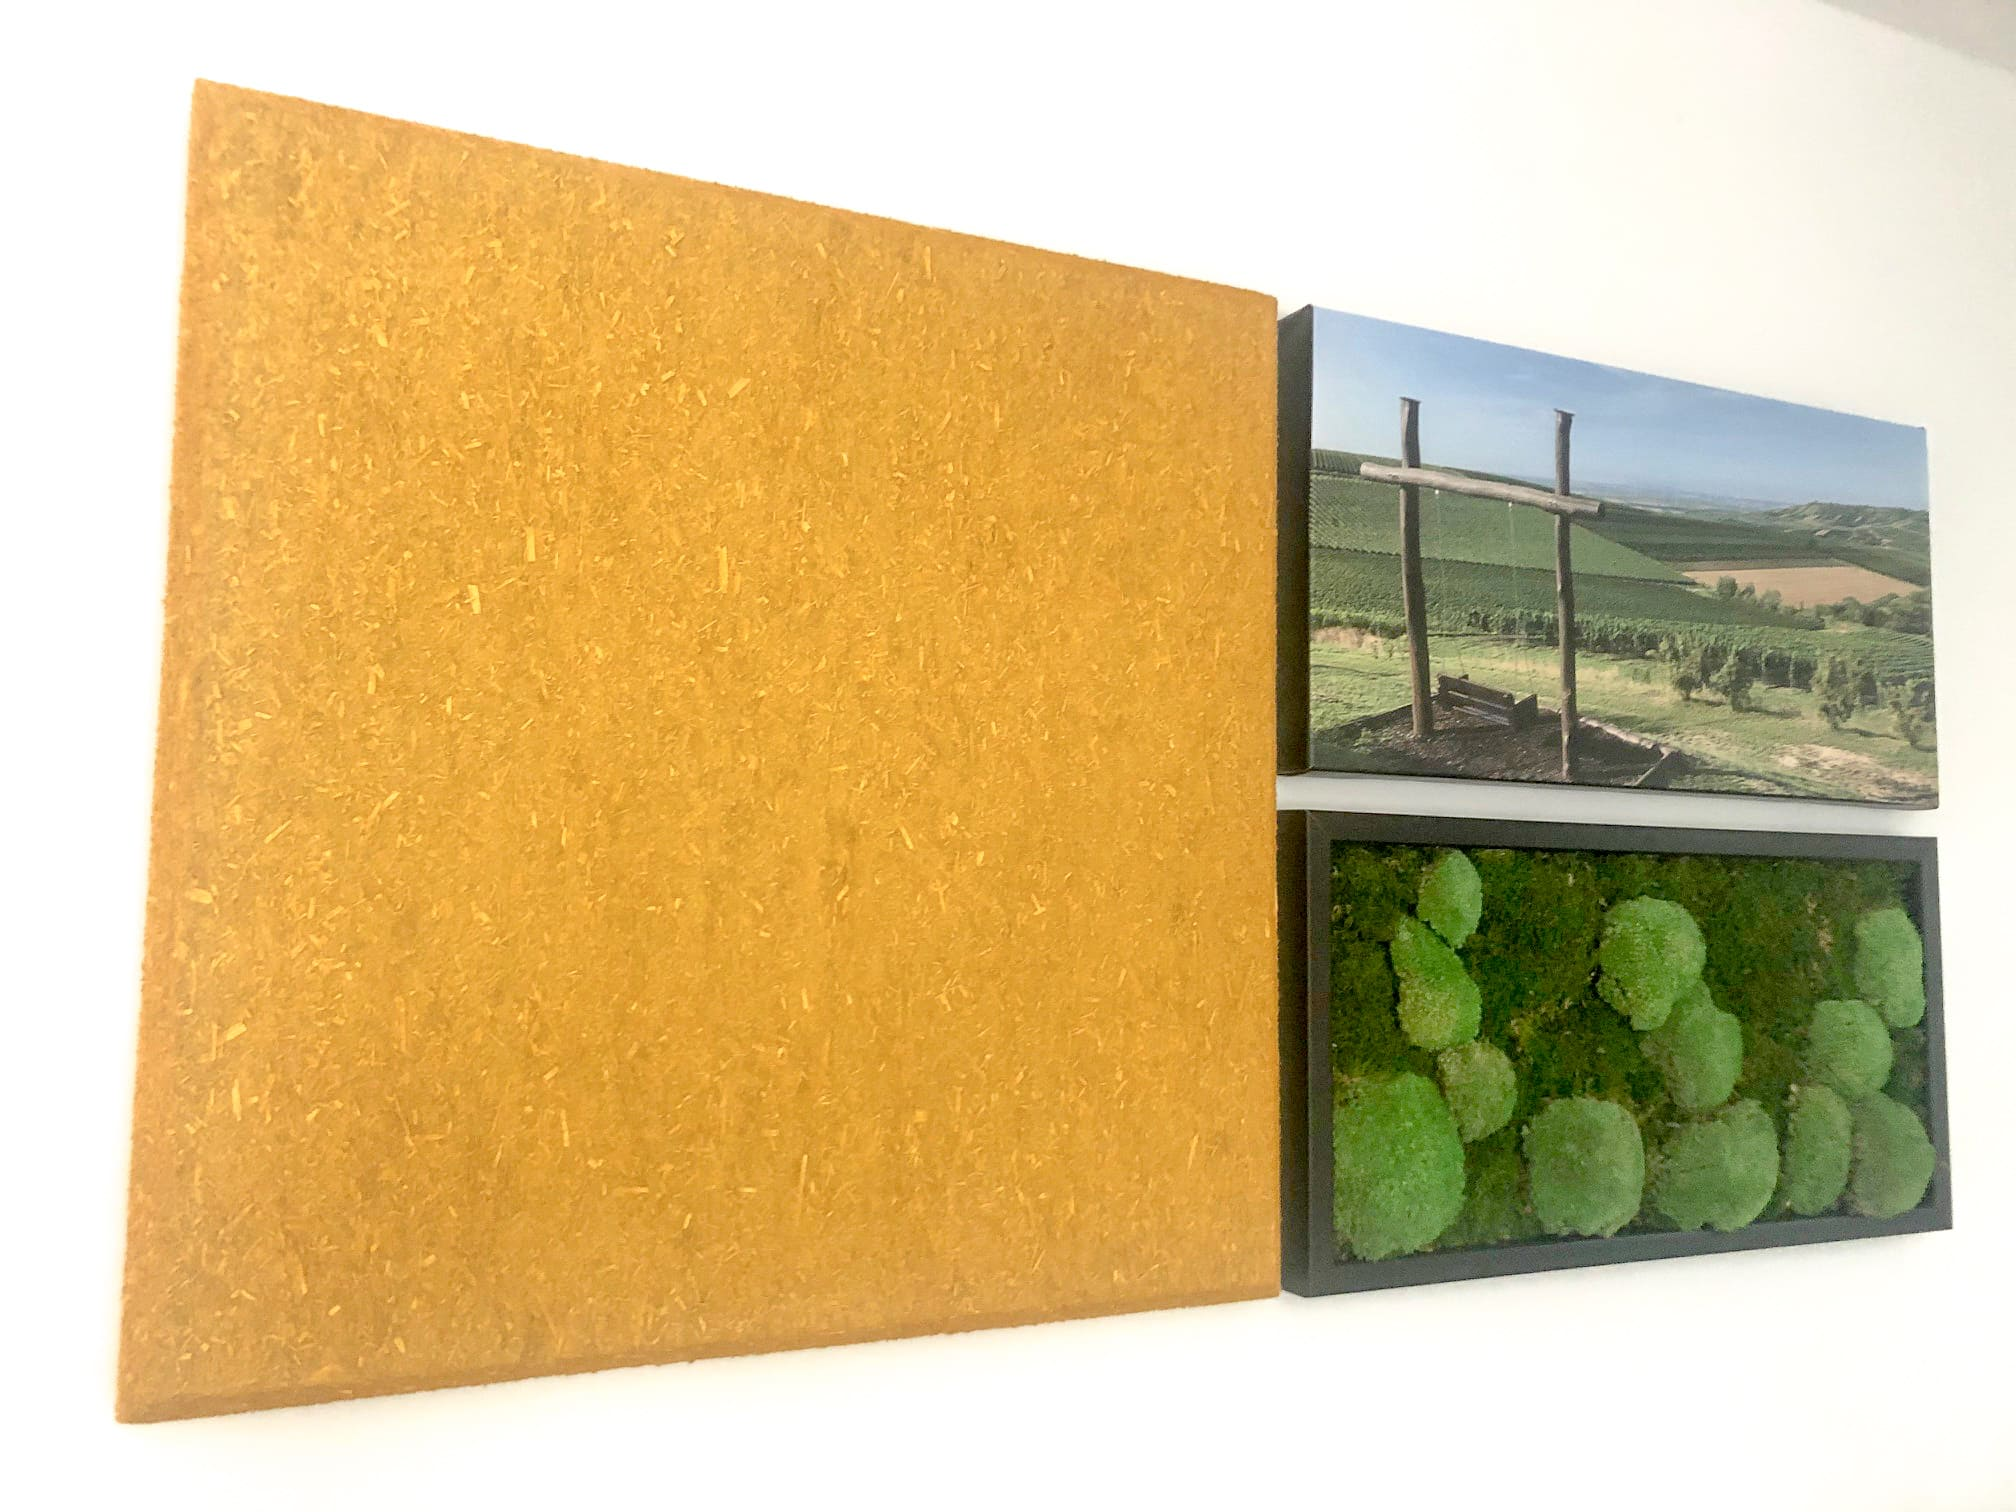 Hanf Akustikplatten Flur mit Moos Bild